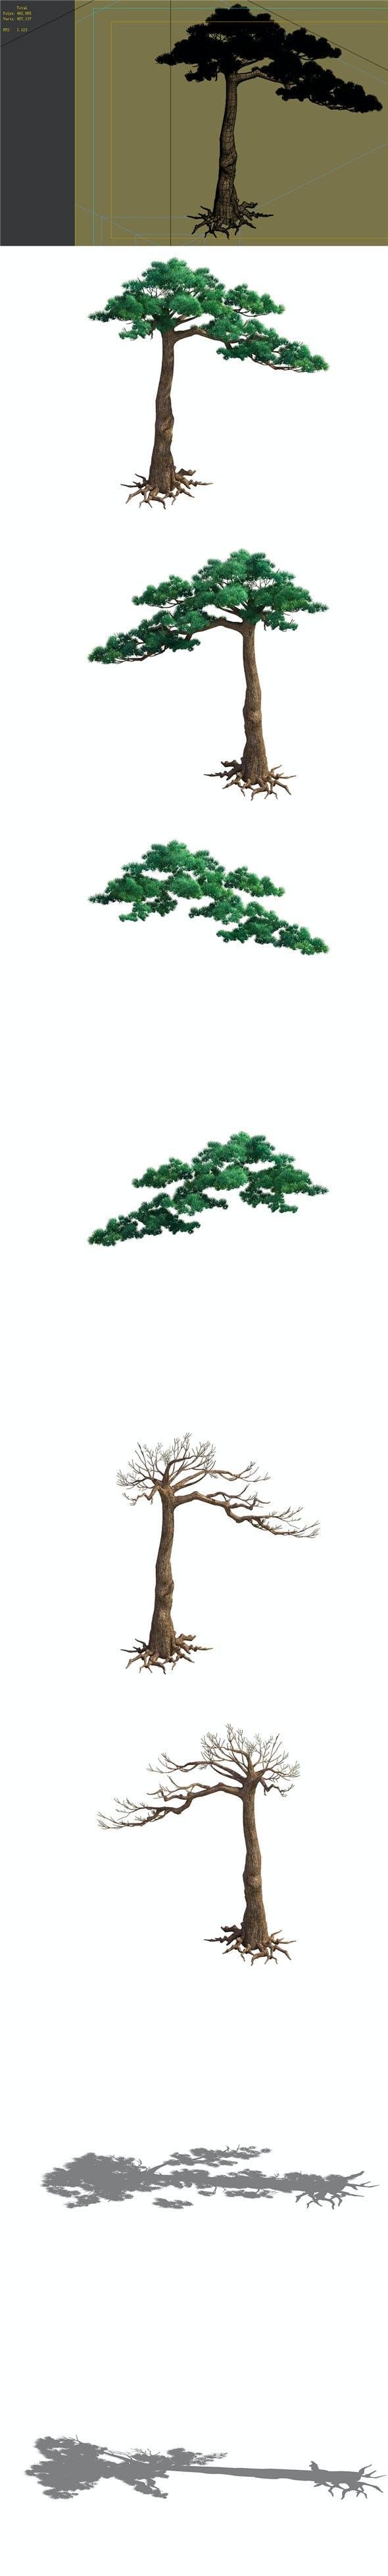 Game Model - Taoist comprehension scene - Pine 07 01 - 3DOcean Item for Sale